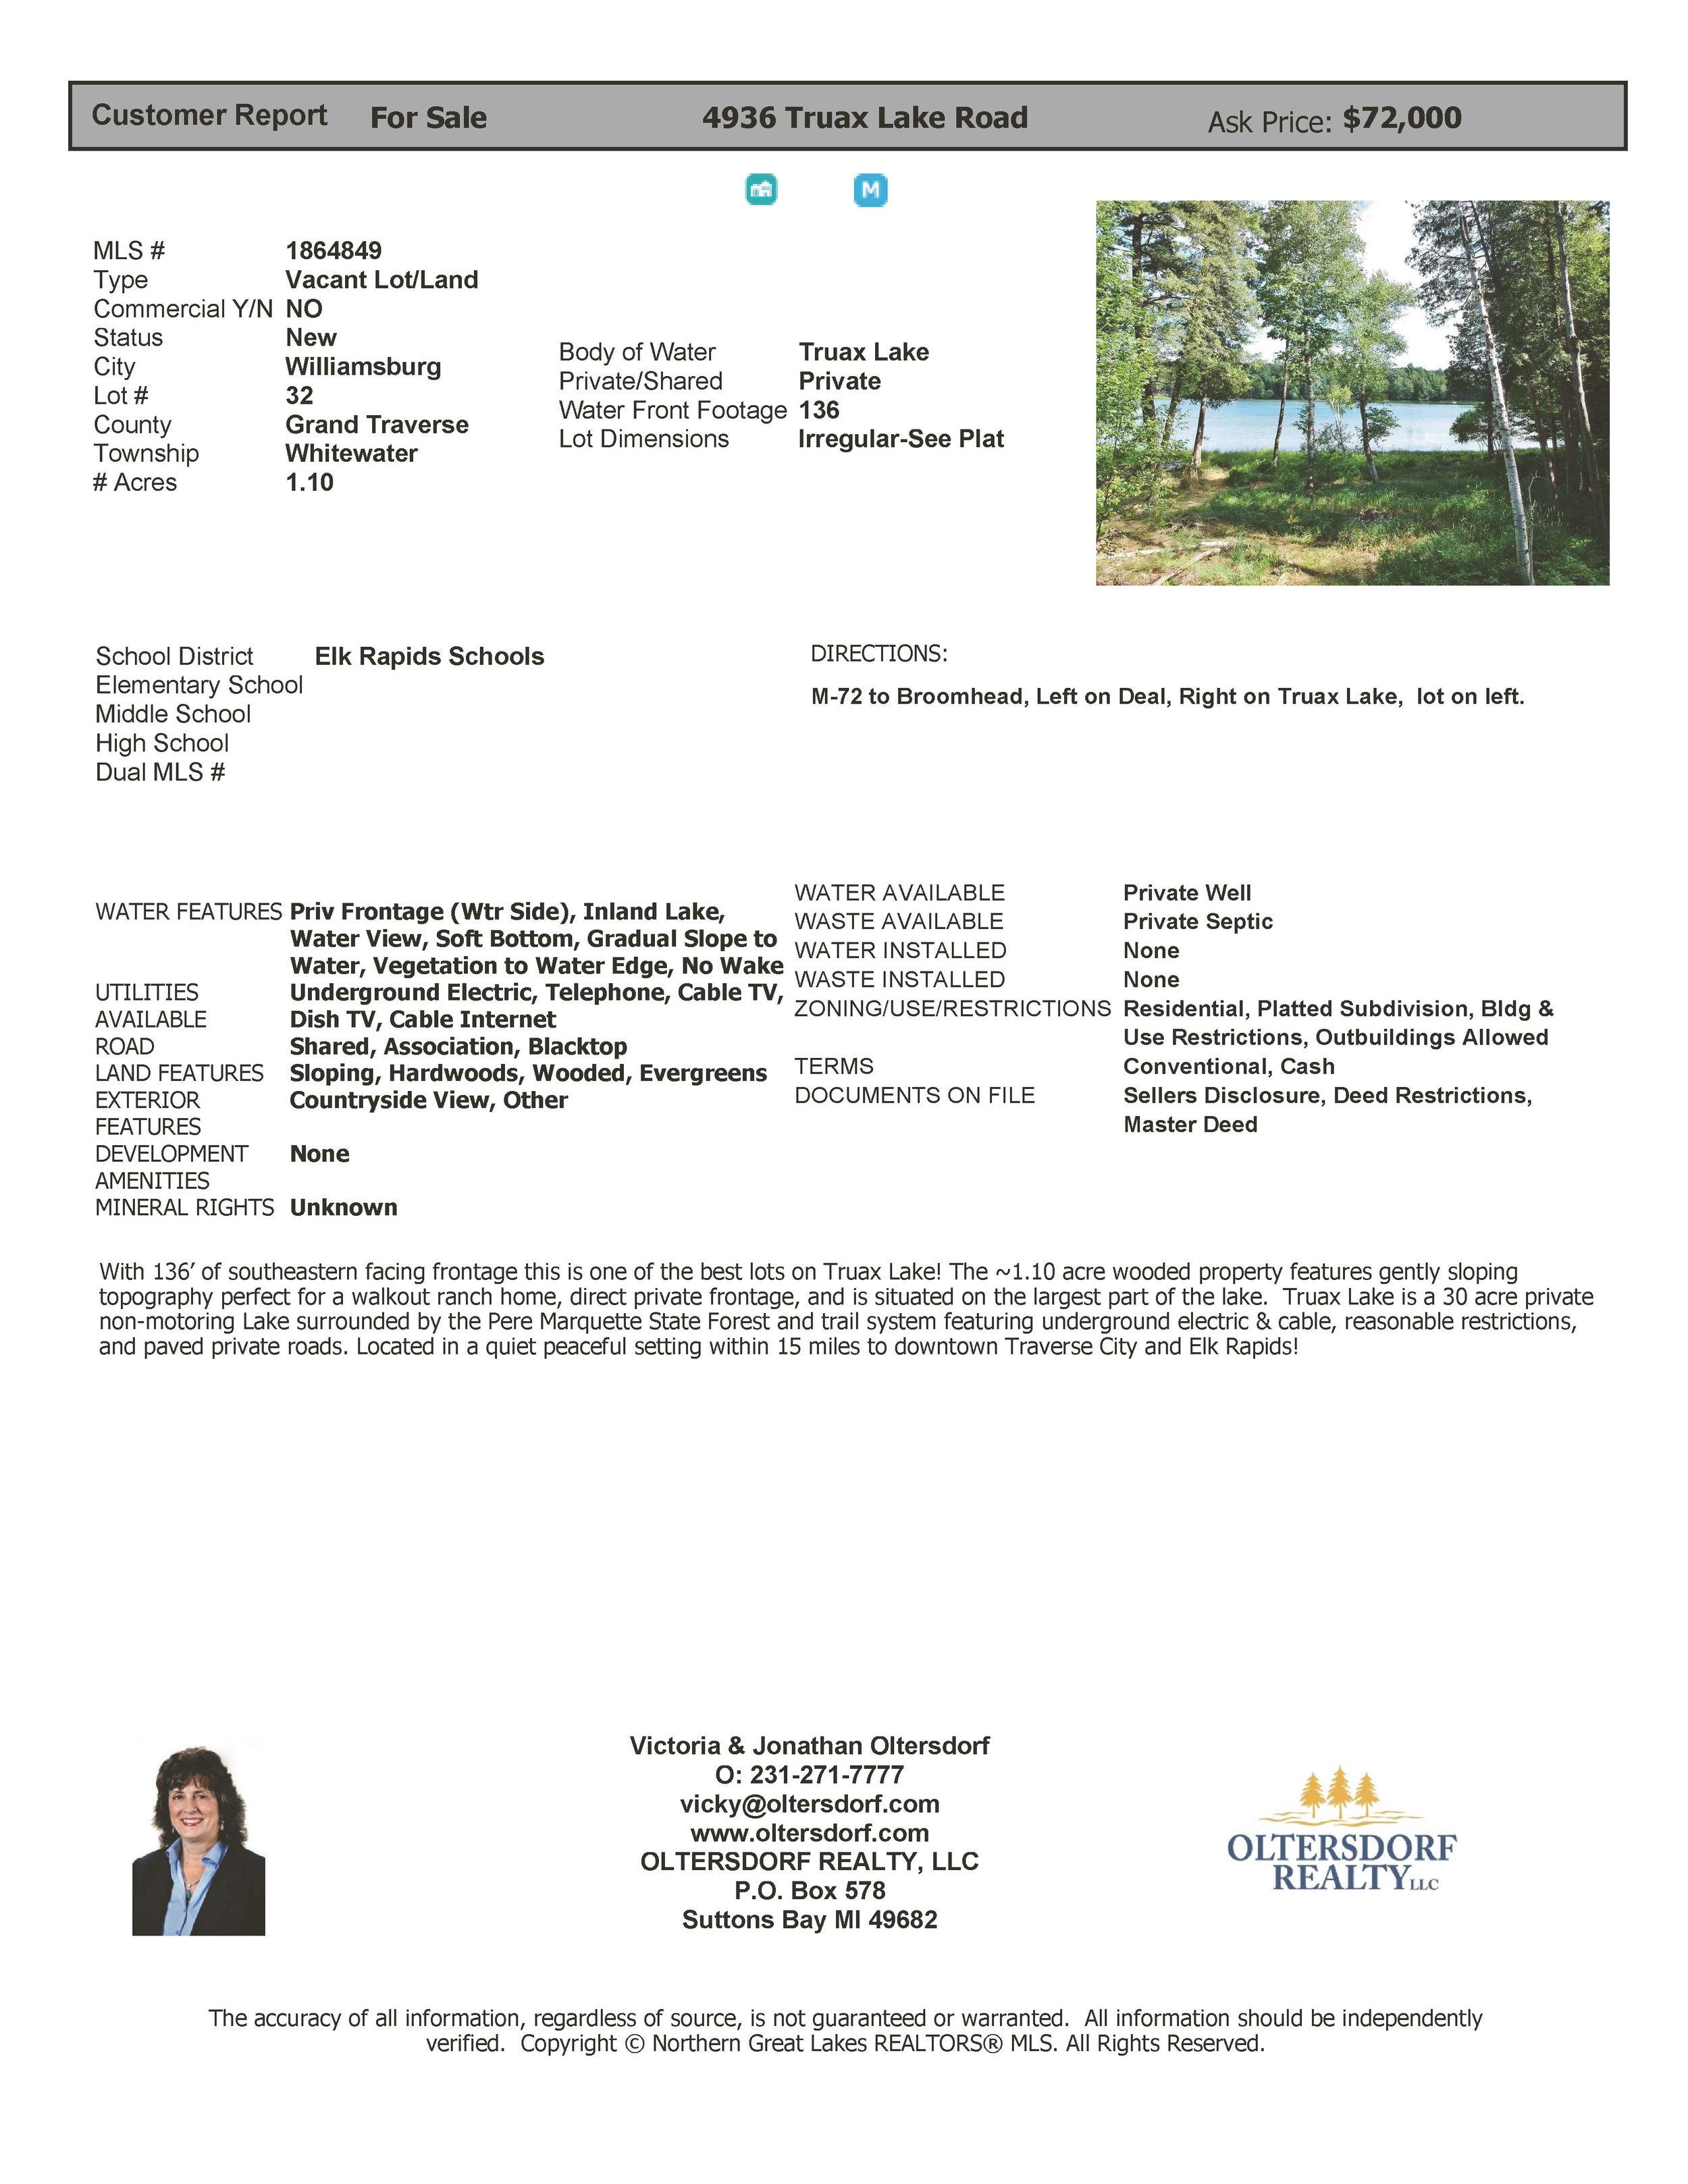 4936 Truax Lake Road, Williamsburg Marketing - For Sale by Oltersdorf Realty LLC (4).jpg